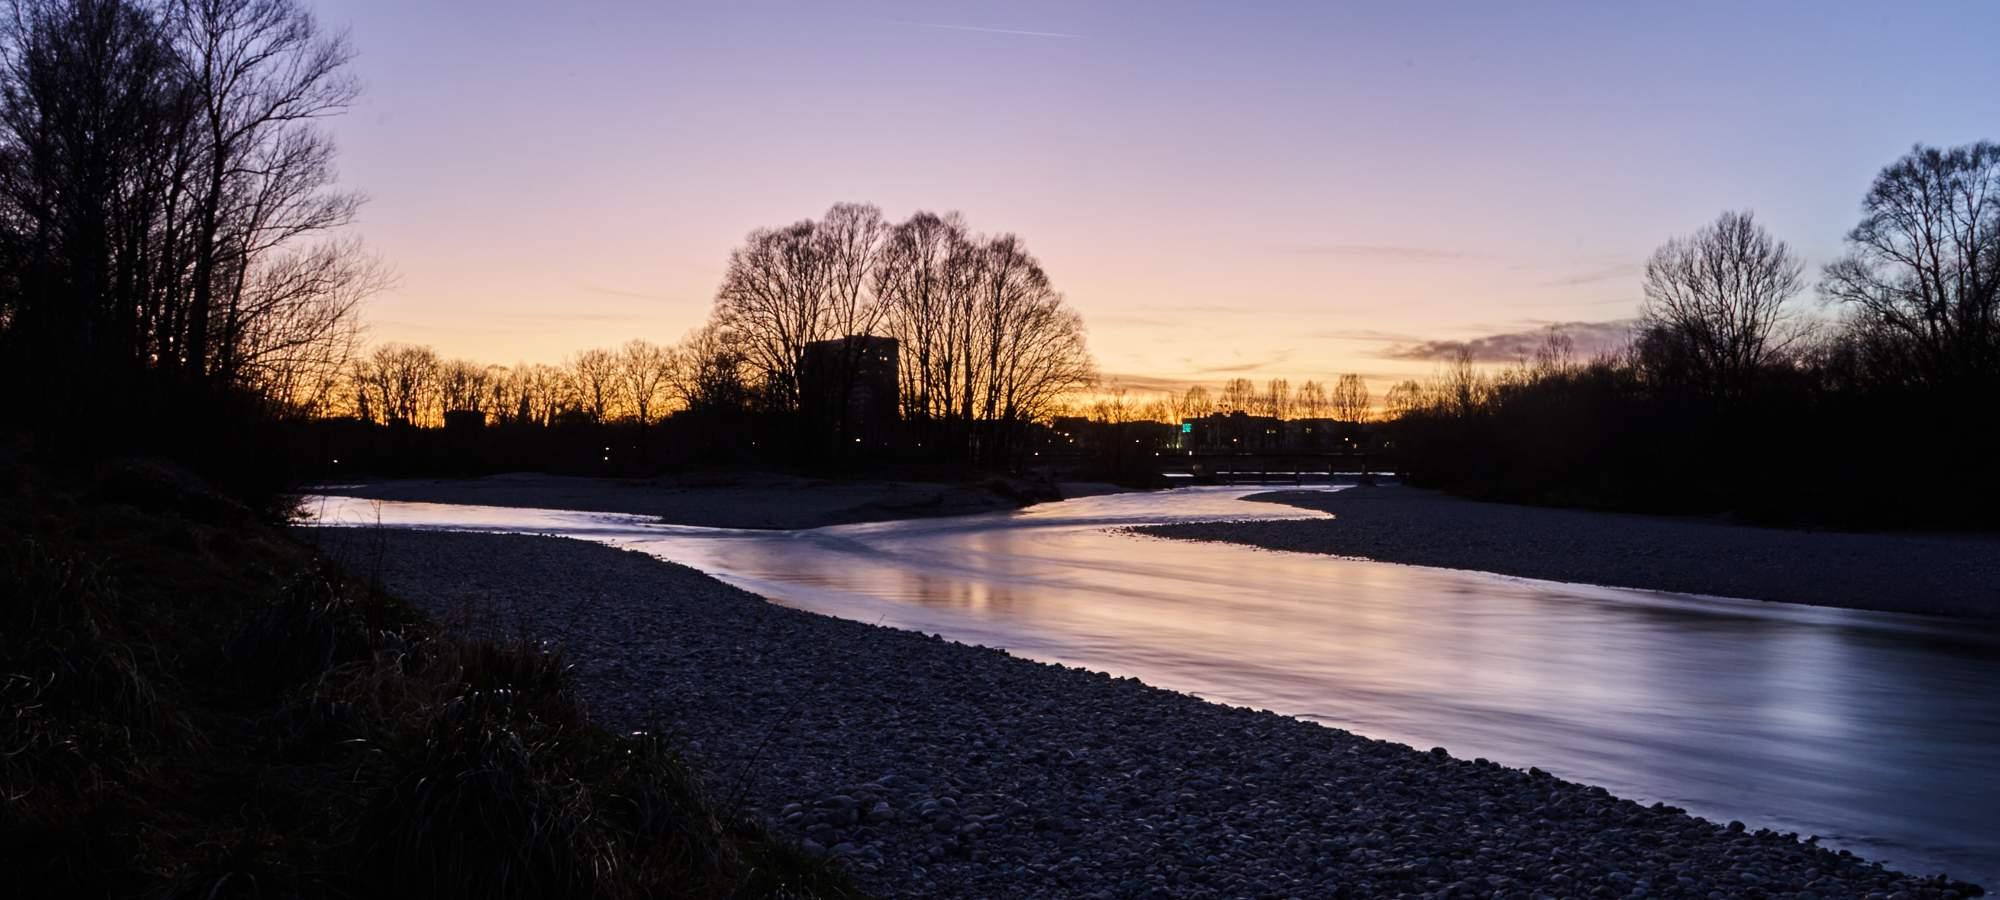 Abendrot-Fluss-Isar